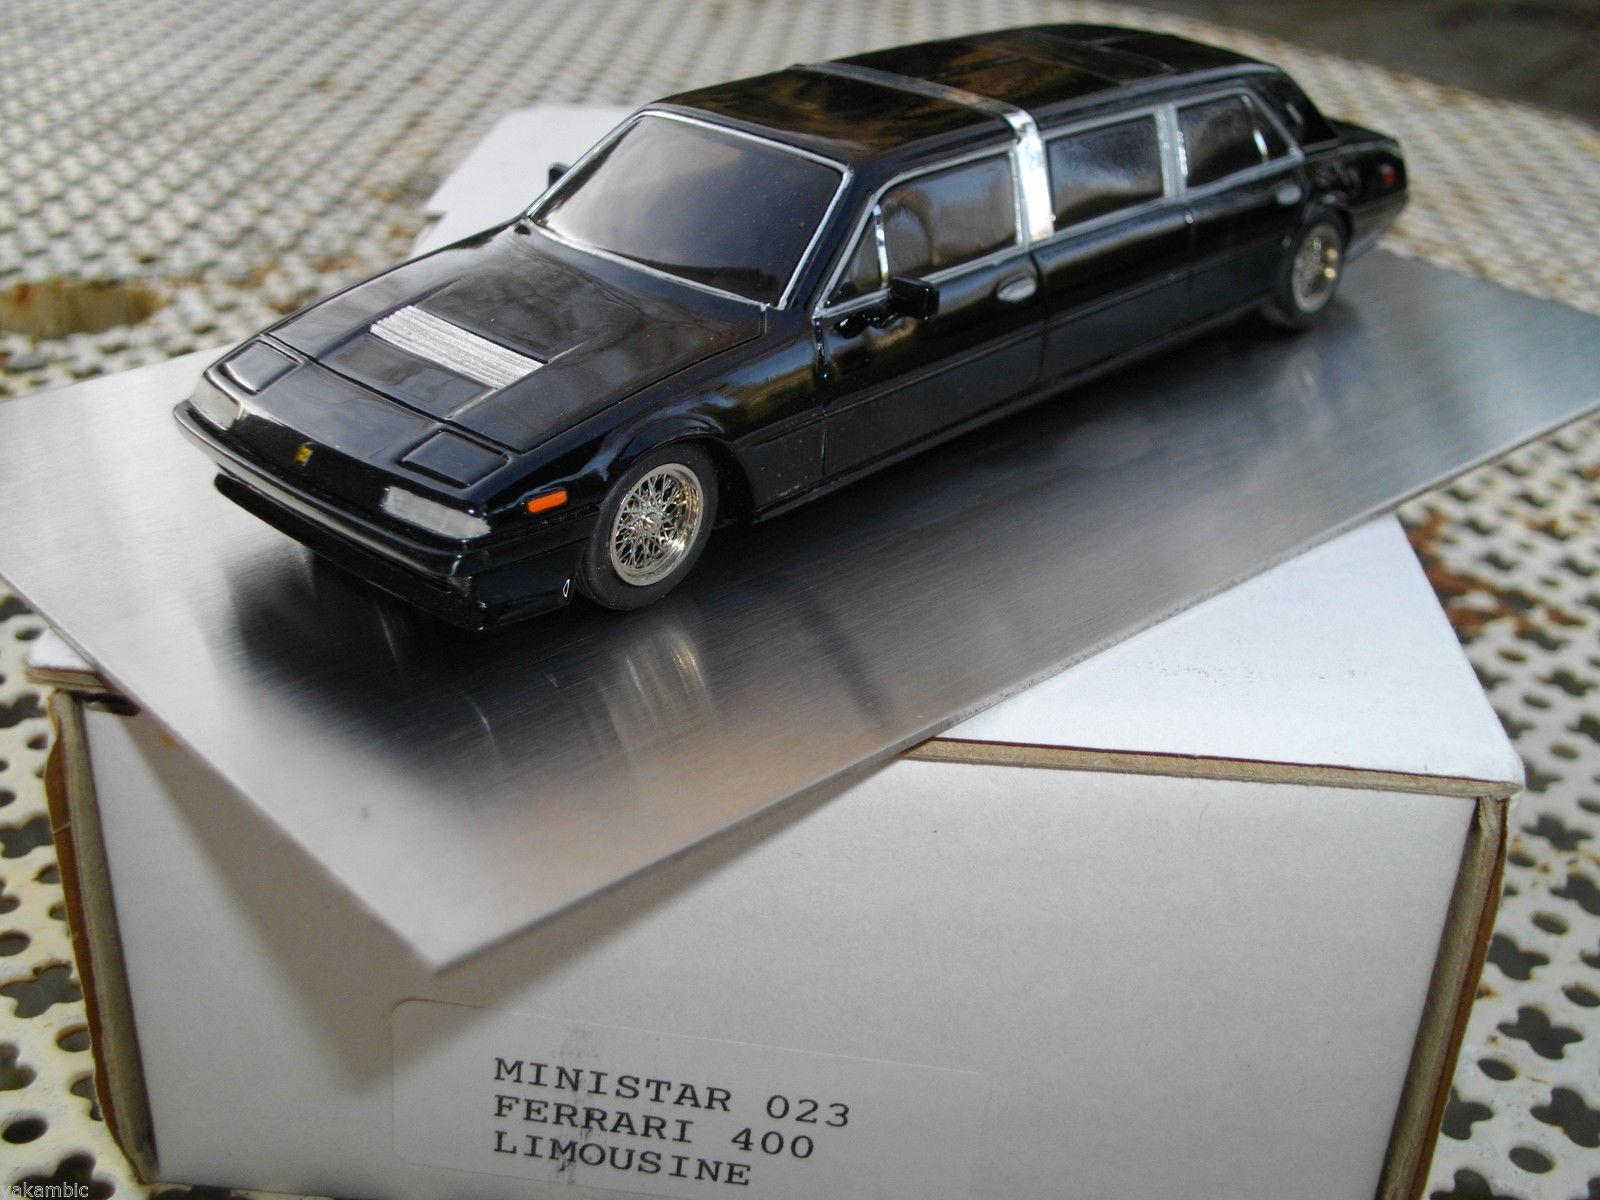 Ferrari 400 2015 type ferrari 412 scaglietti 1987 reference 126 note na price 193 vanachro Images